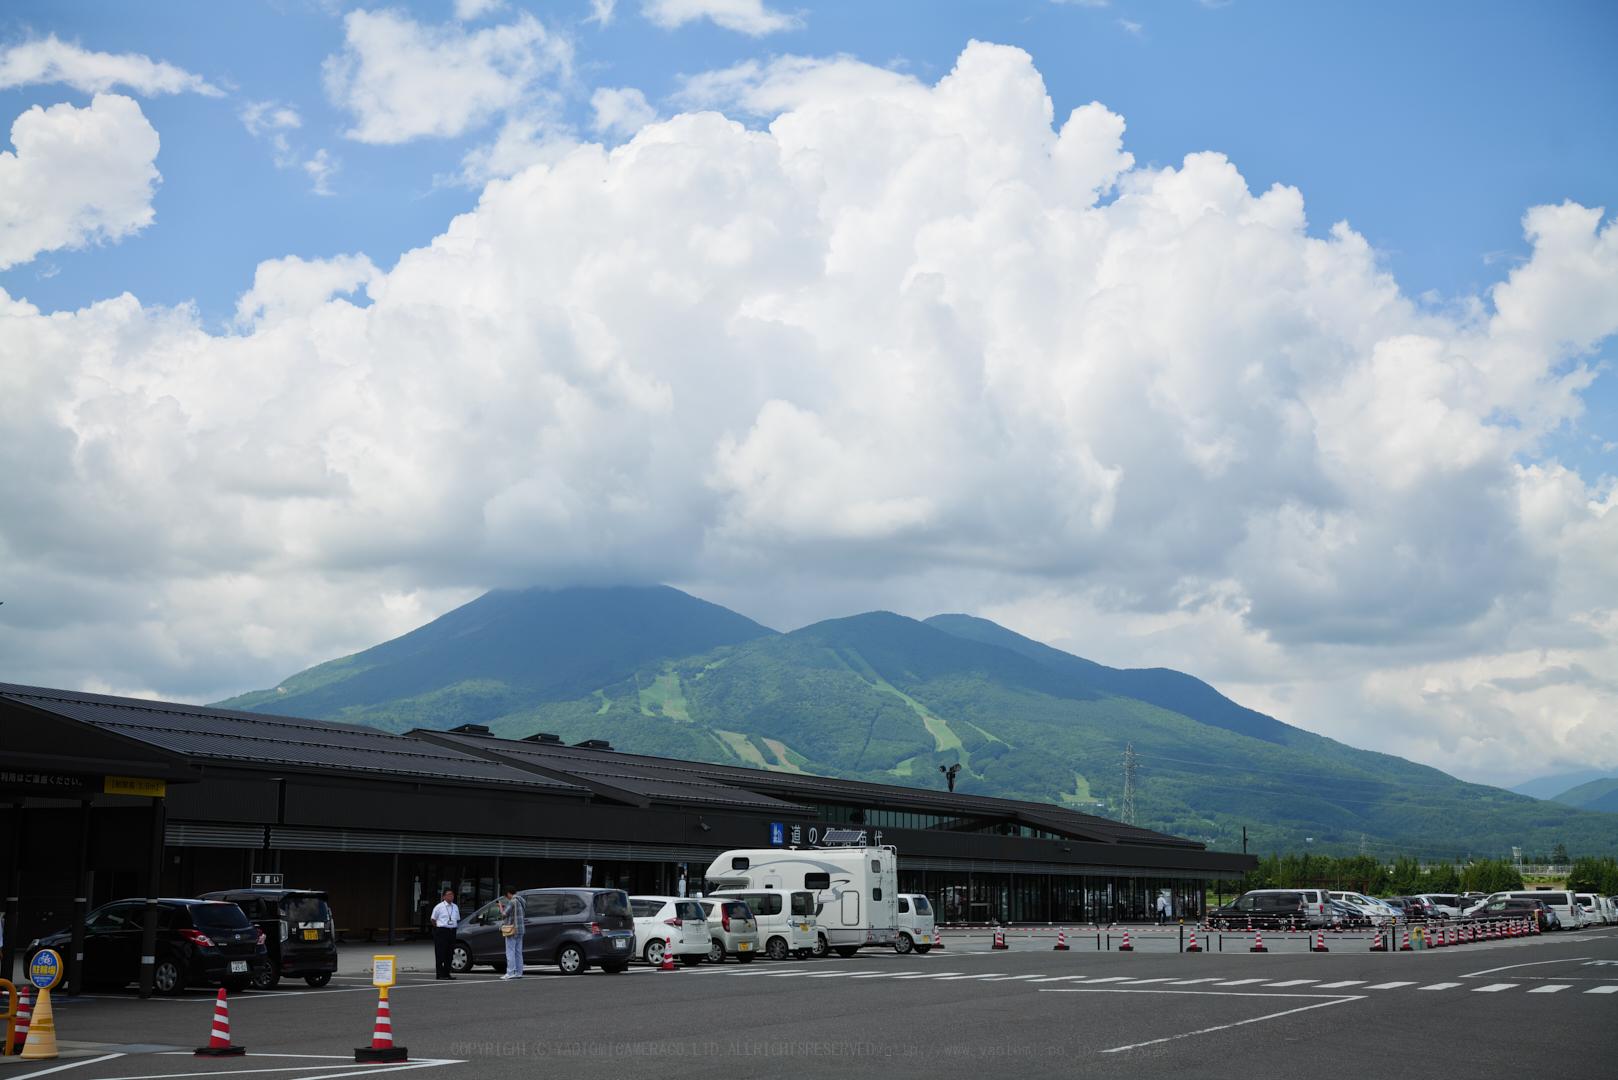 https://www.yaotomi.co.jp/blog/walk/P1011292_45mmF8%2C0iso200%2C45%20mm%2CF8%2Ciso200.jpg